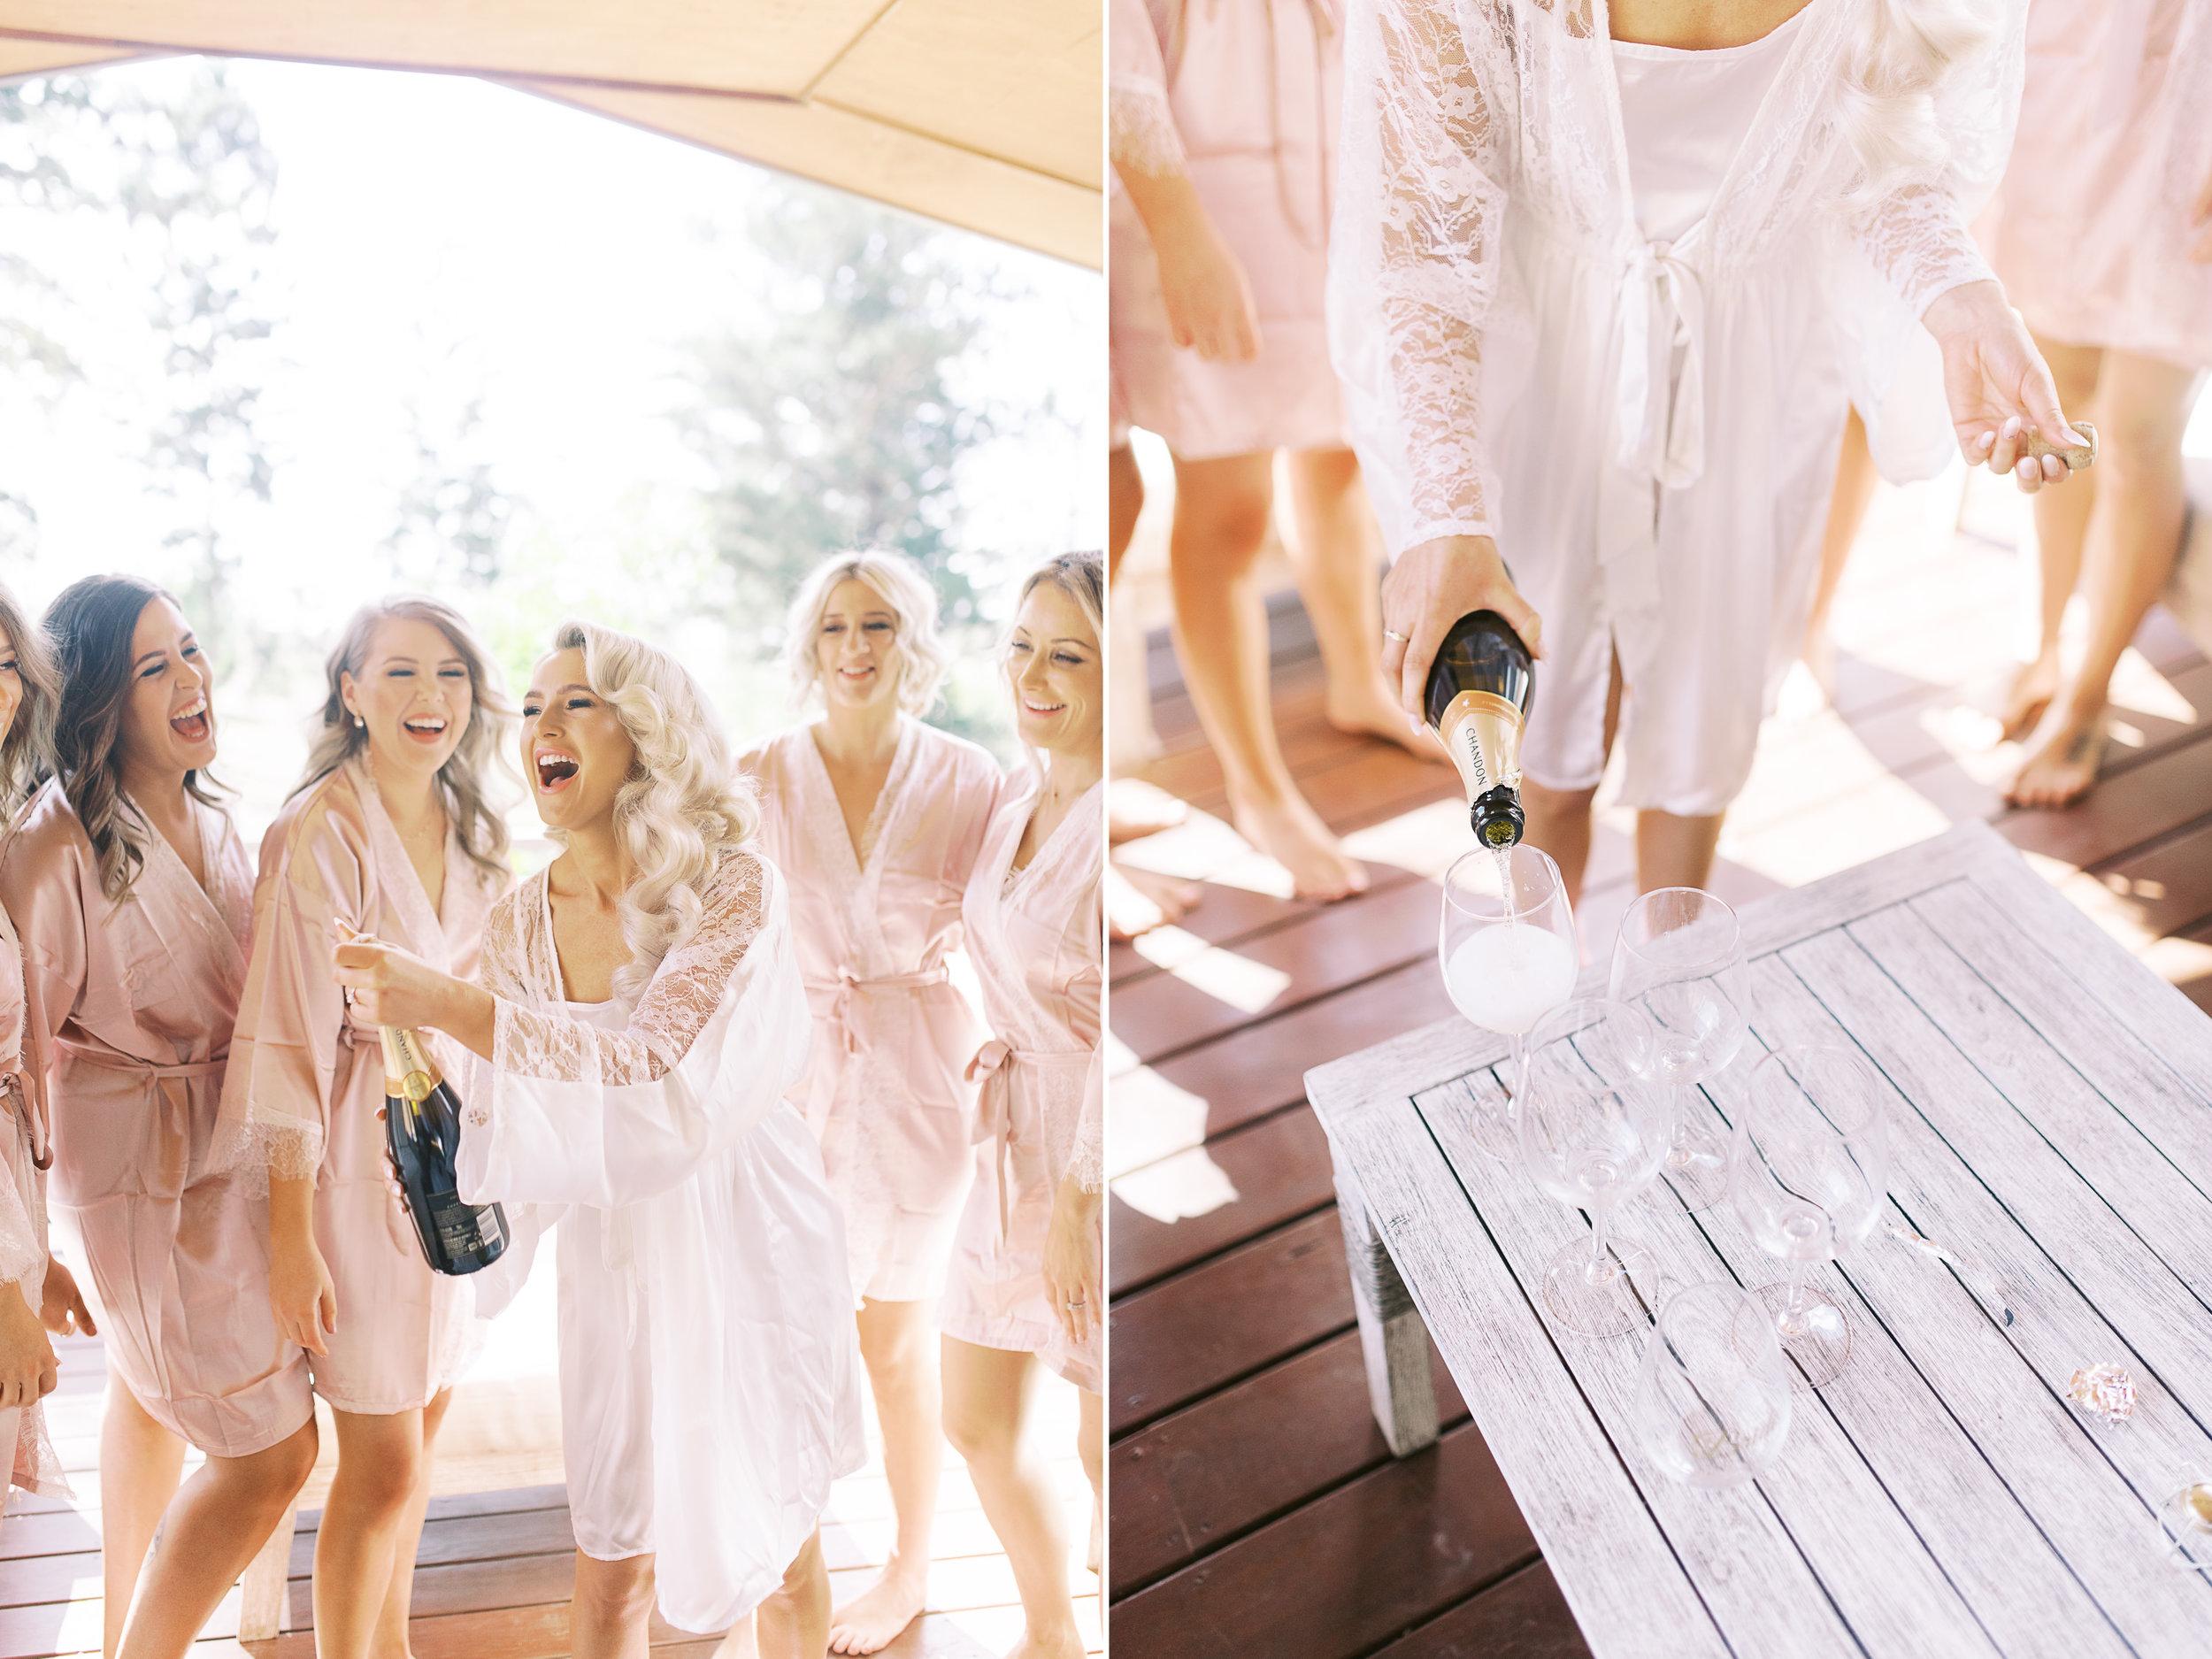 kooroomba-lavendar-farm-film-photography-wedding-photography-romantic-03.jpg